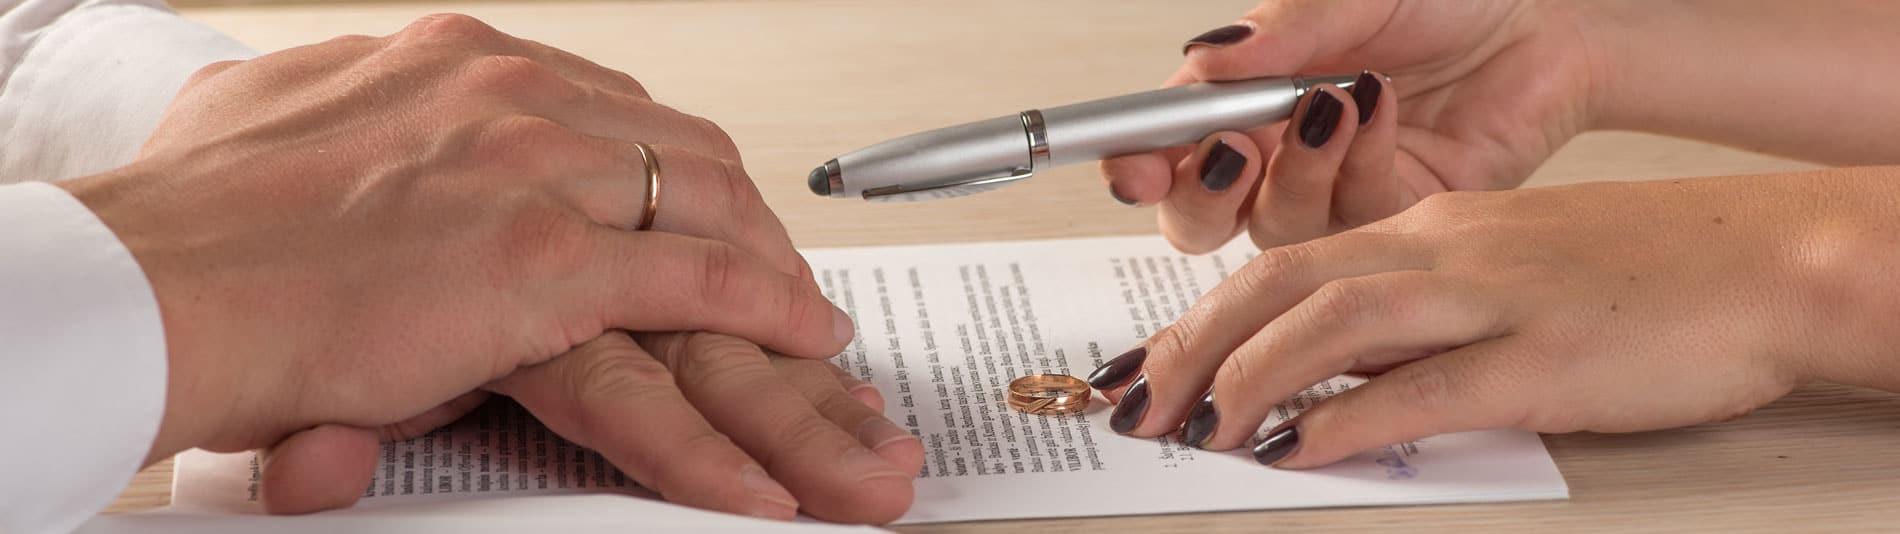 Scheidingsbemiddeling mediation scheiding